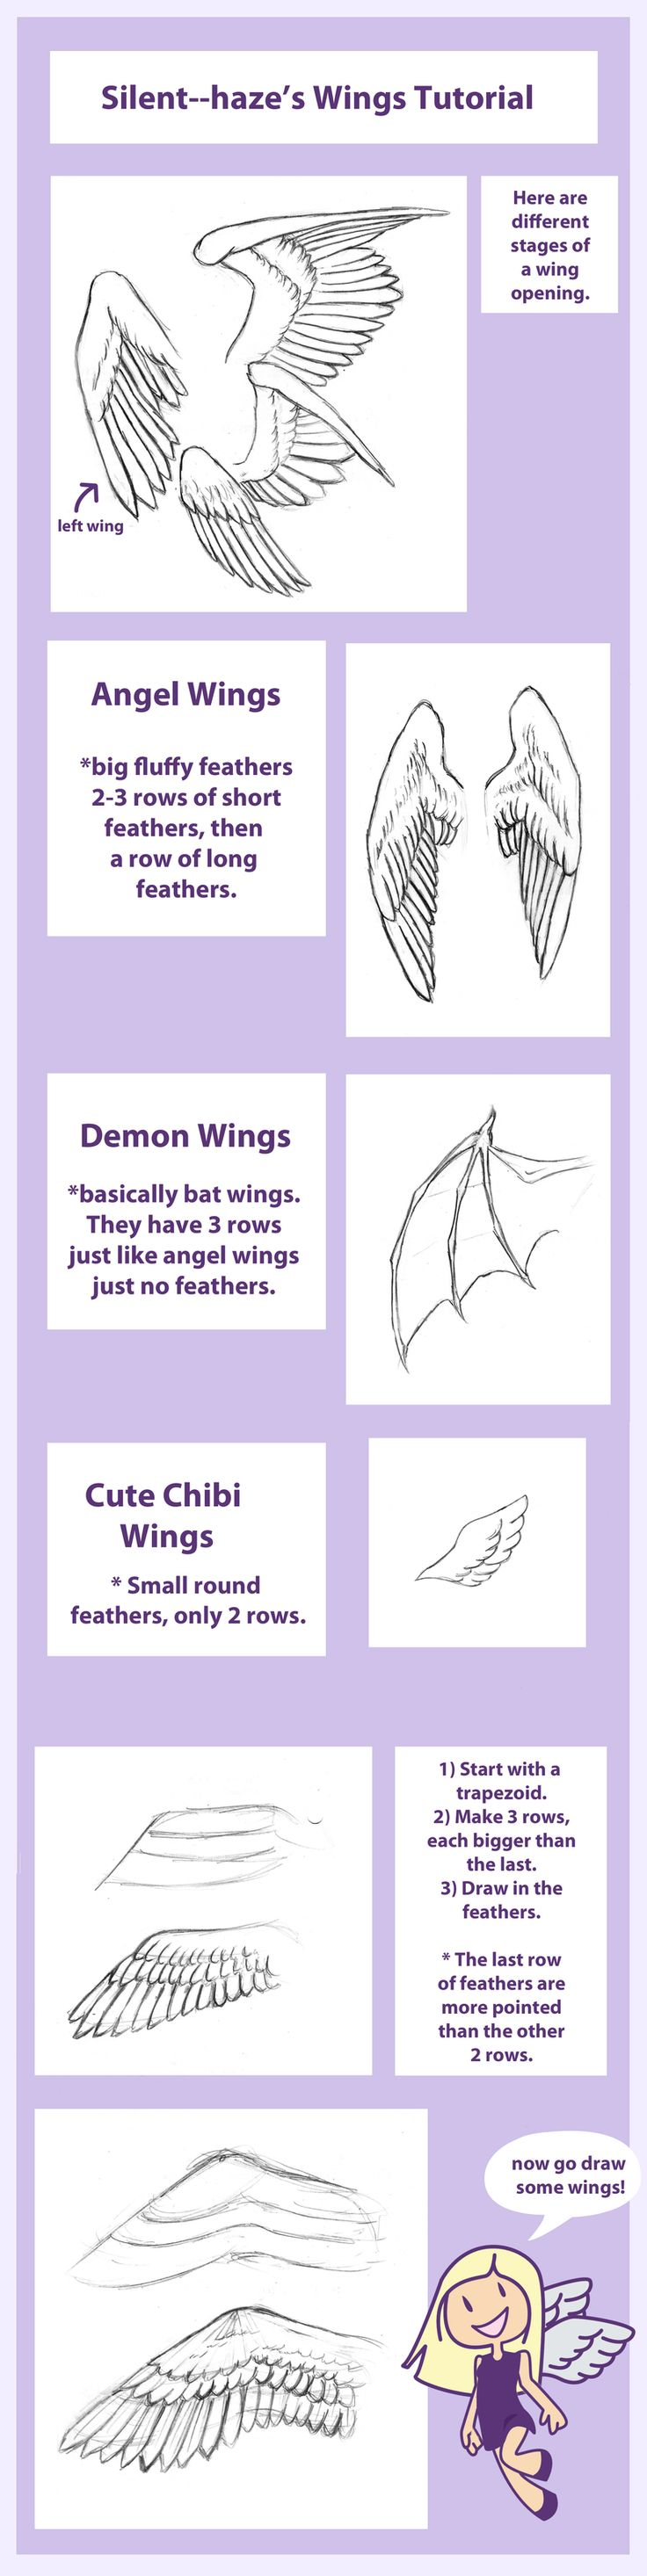 Wing Tutorial by Silent--Haze.deviantart.com